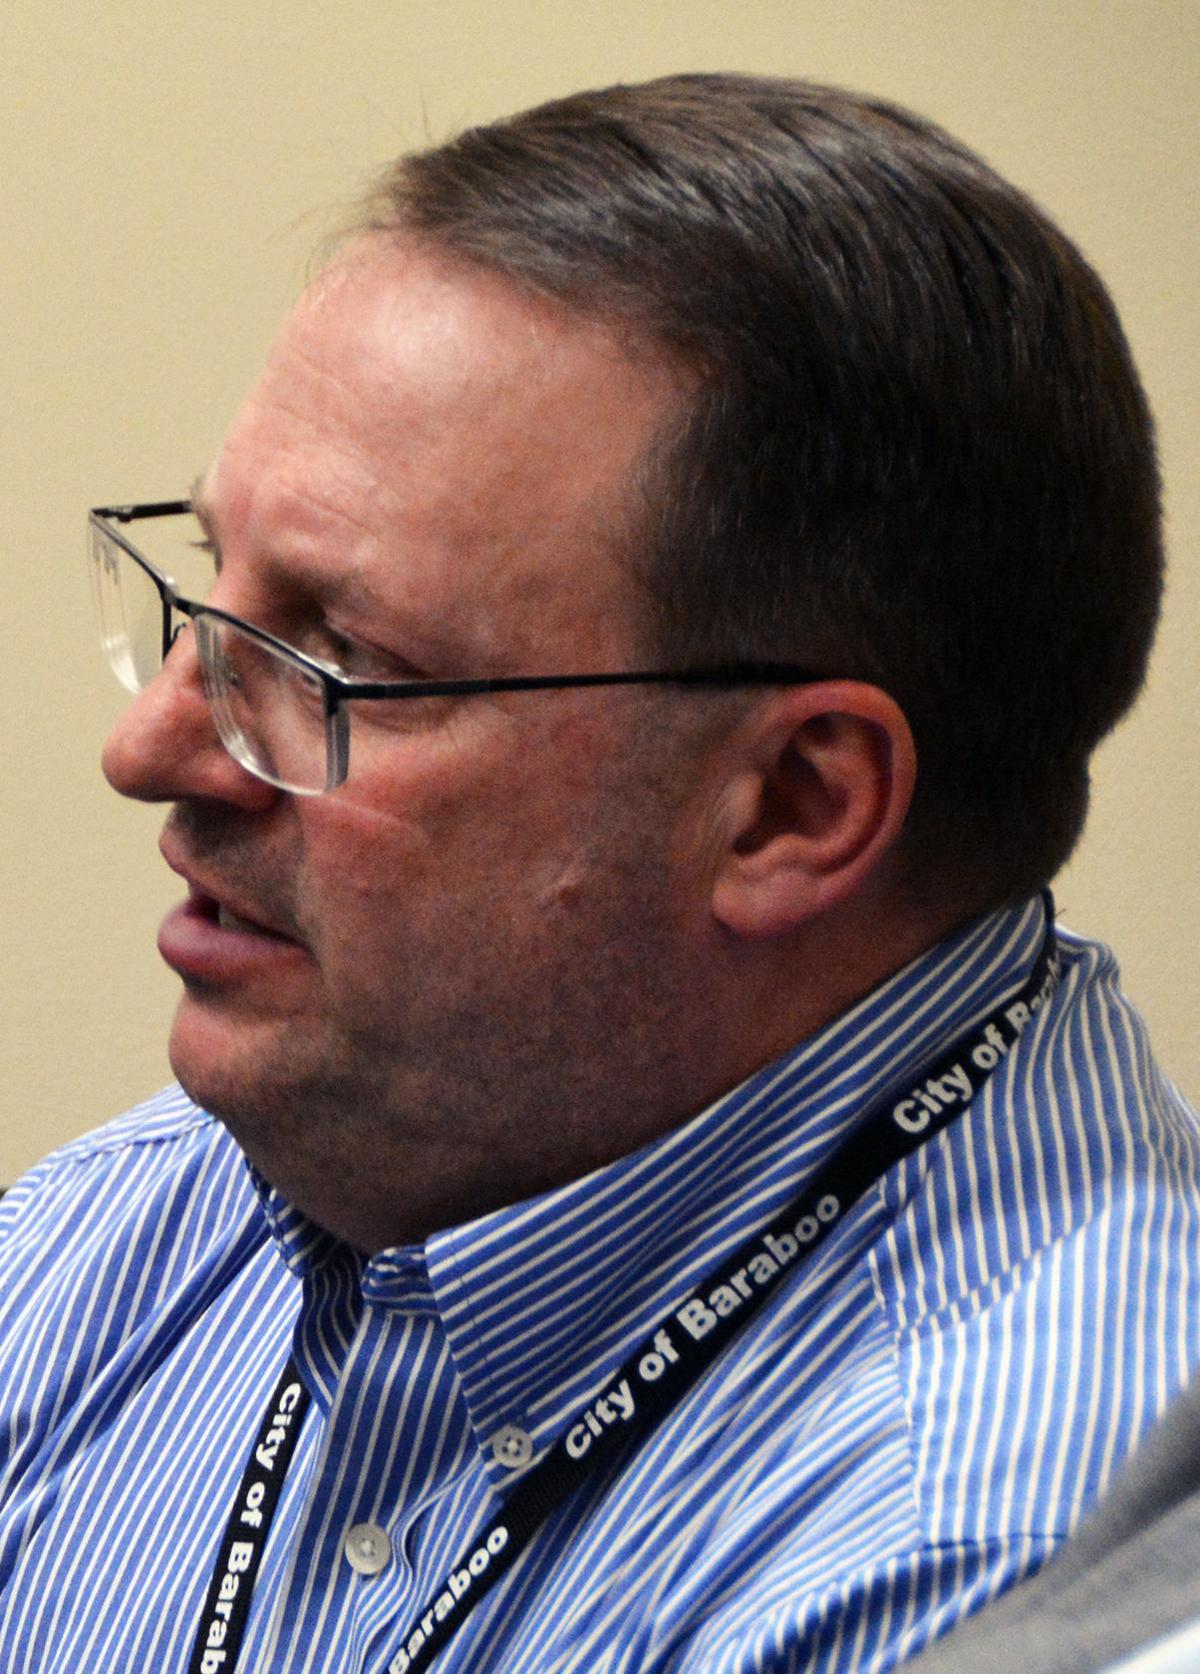 Tom Pinion, Baraboo director of Public Works